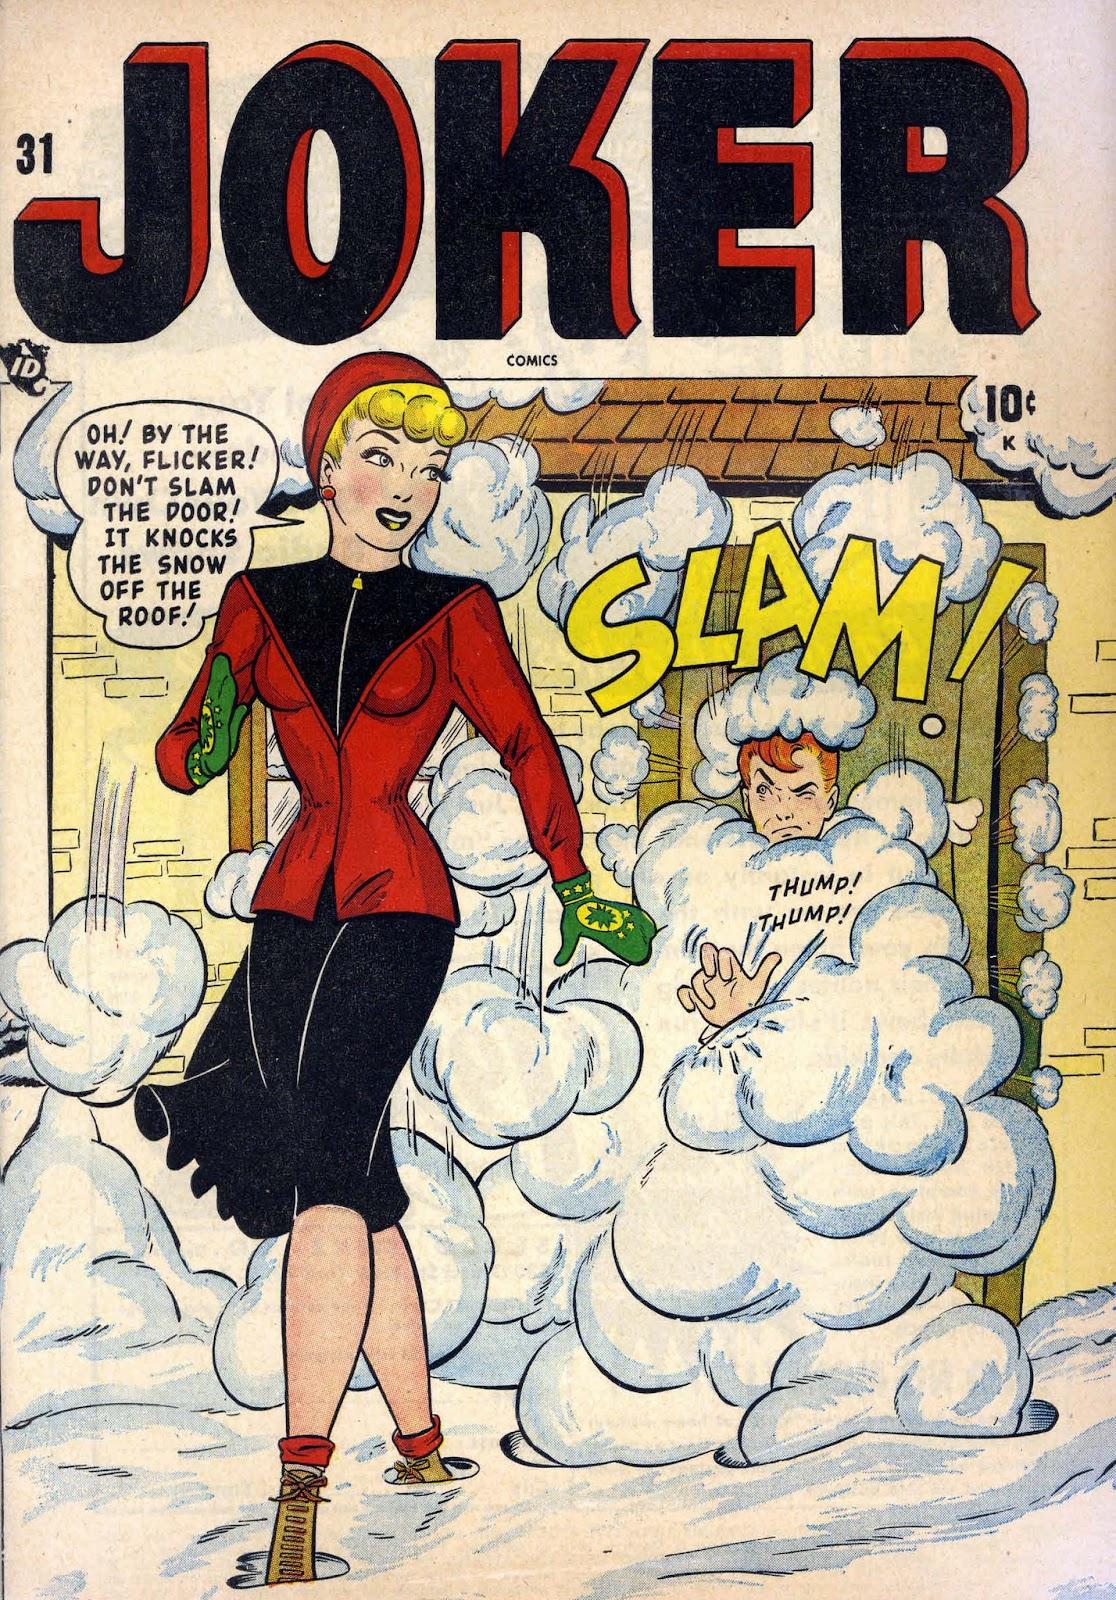 Read online Joker Comics comic -  Issue #31 - 1